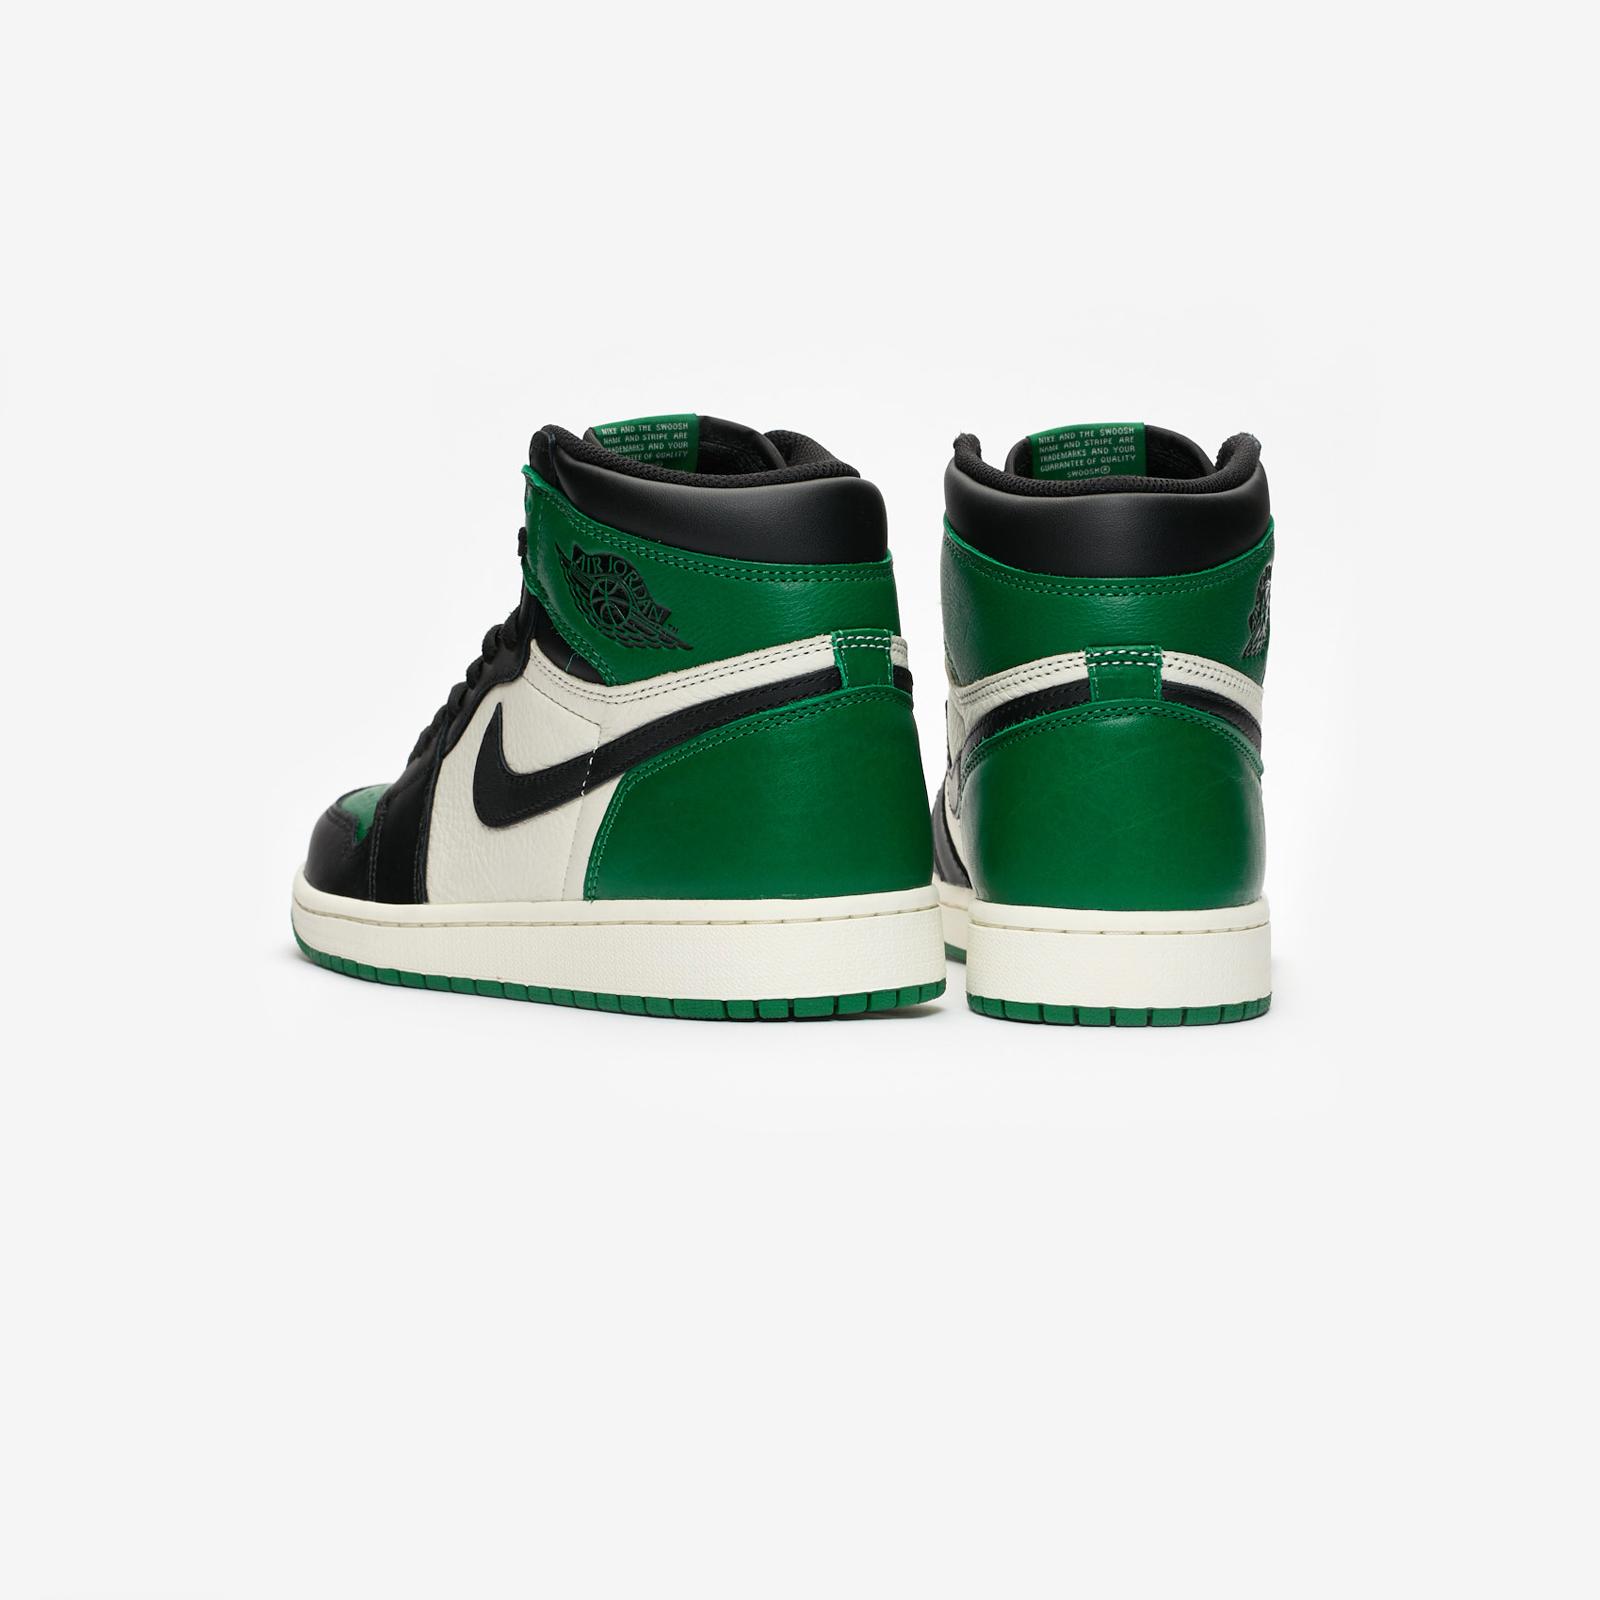 95cbc224f1c9d9 Jordan Brand Air Jordan 1 Retro High OG - 555088-302 - Sneakersnstuff